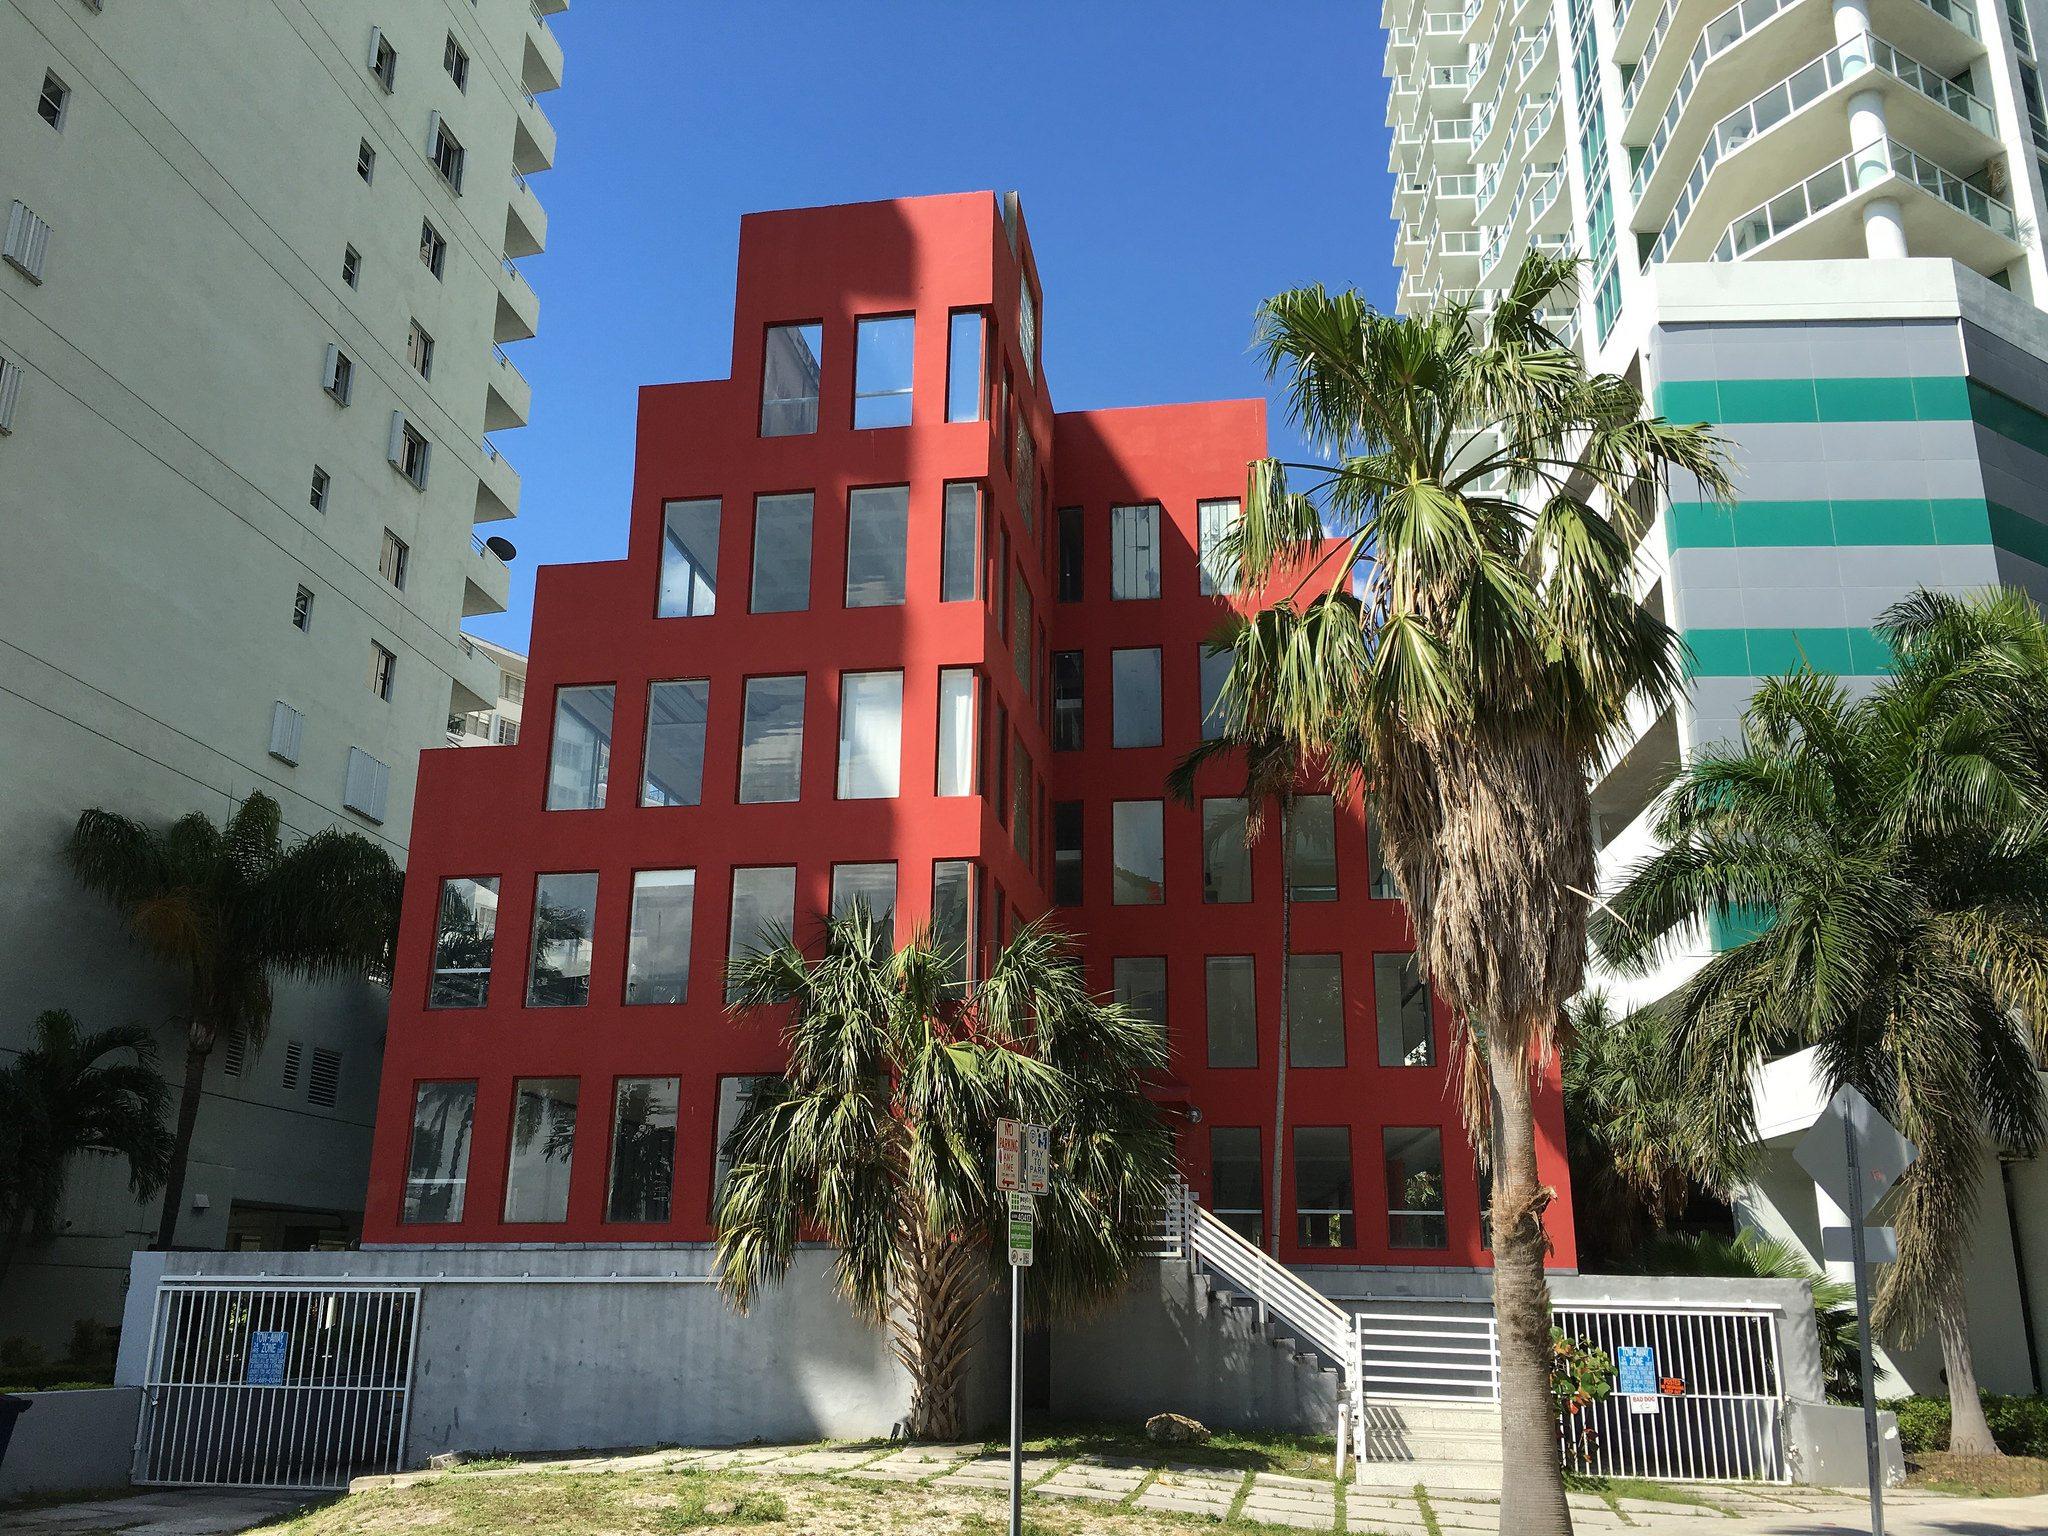 Babylon Apartments. Photo by Phillip Pessar.